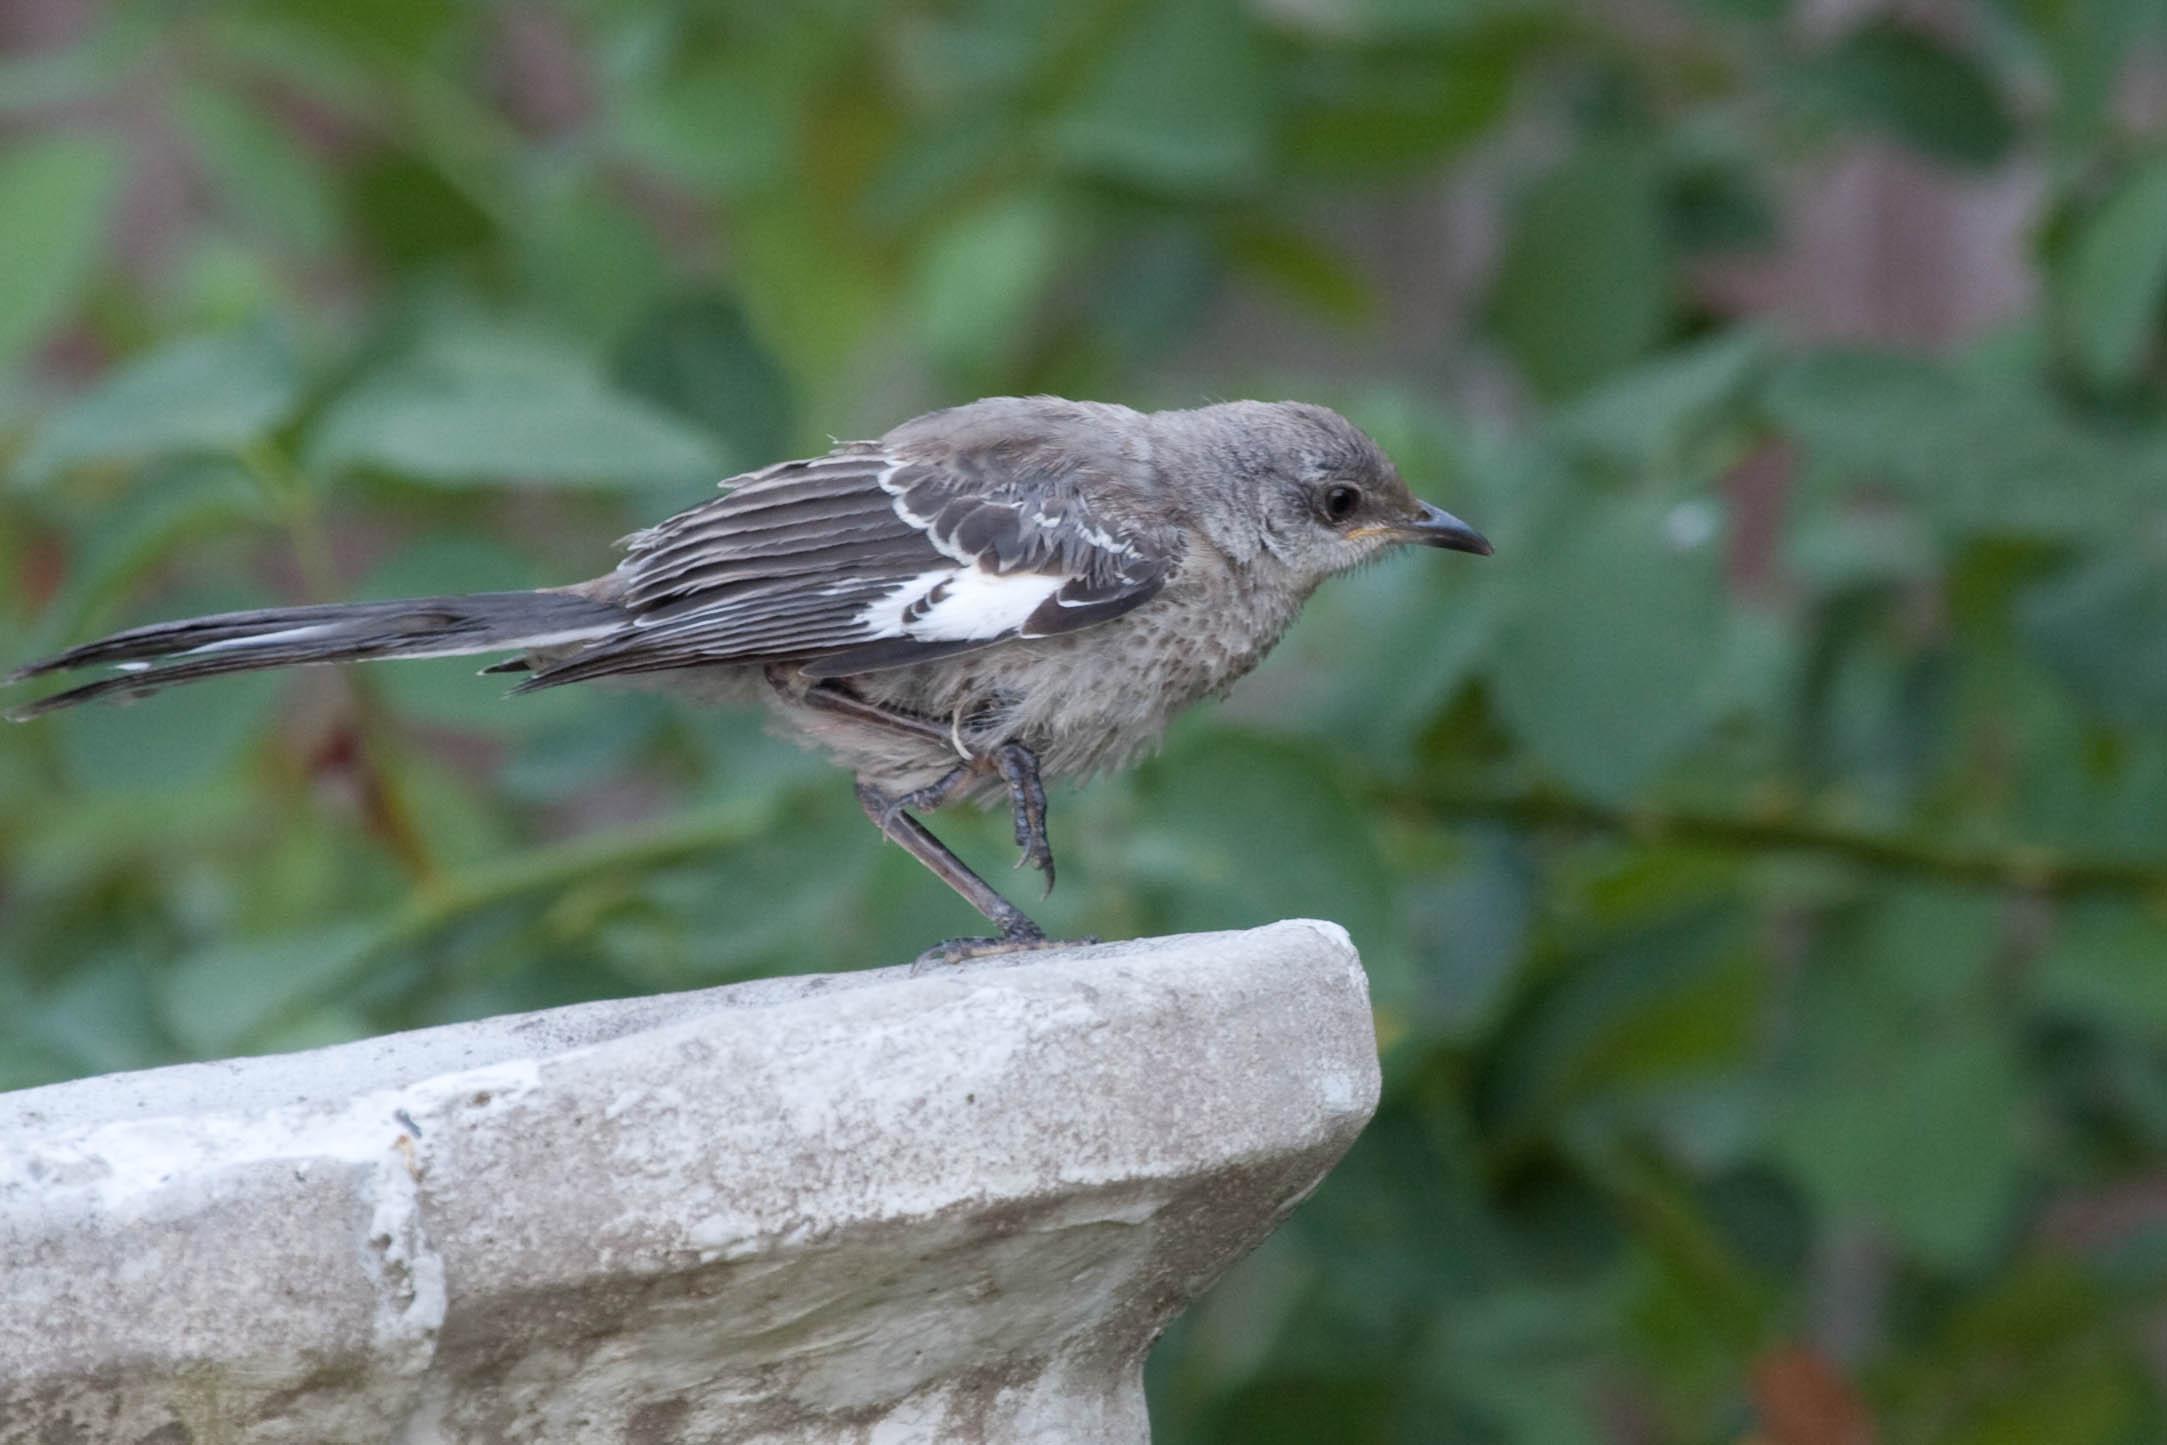 Ann Brokelman Photography: Baby Mockingbird flapping wings ...  Newborn Mockingbird